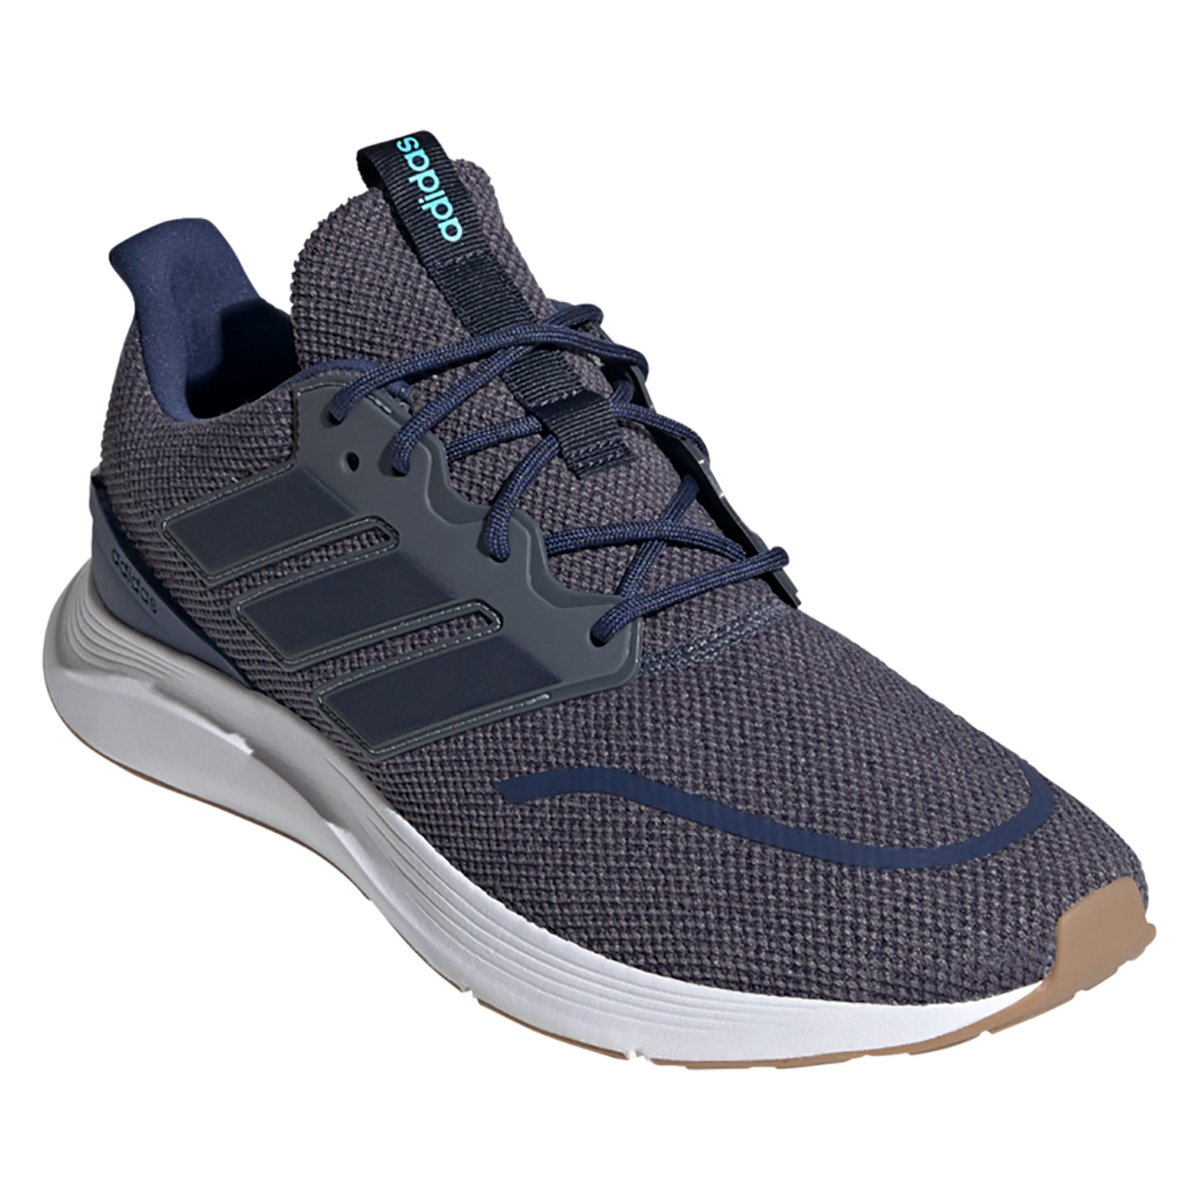 Tenis Adidas Cinza/Marinho Masculino Energy Falcon